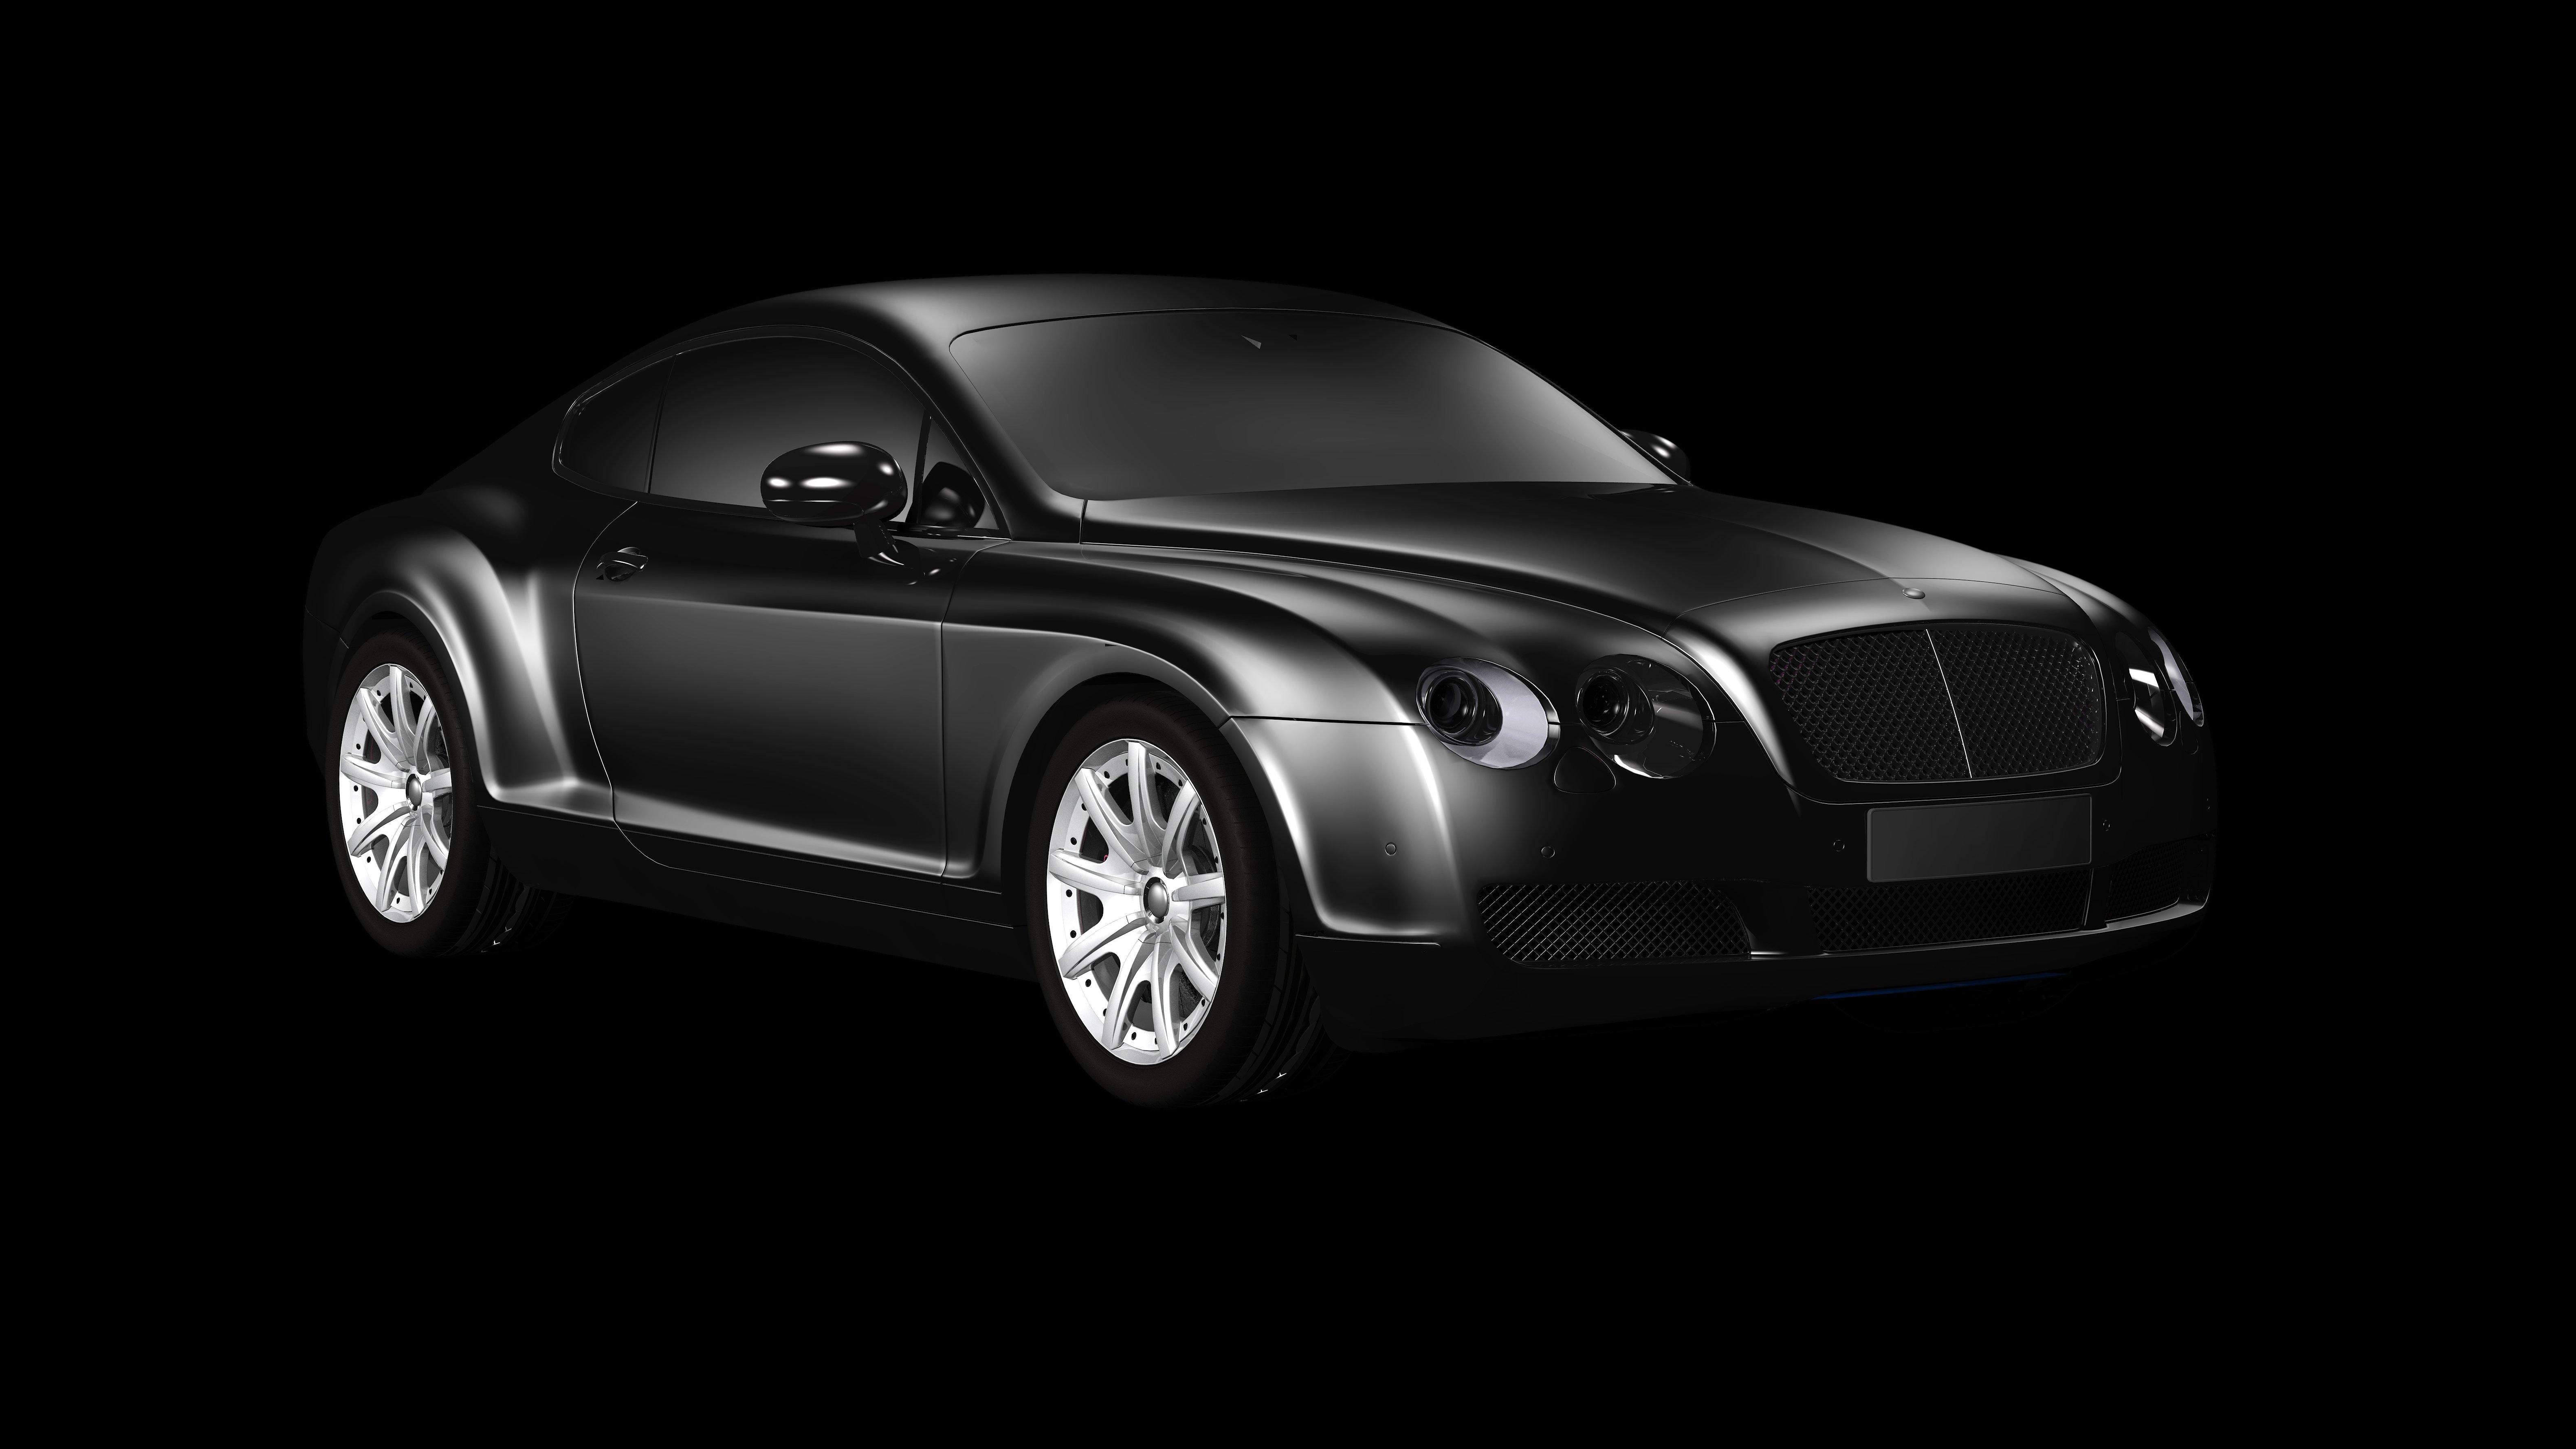 Free picture black car monochrome vehicle automotive wheel modern automobile coupe car